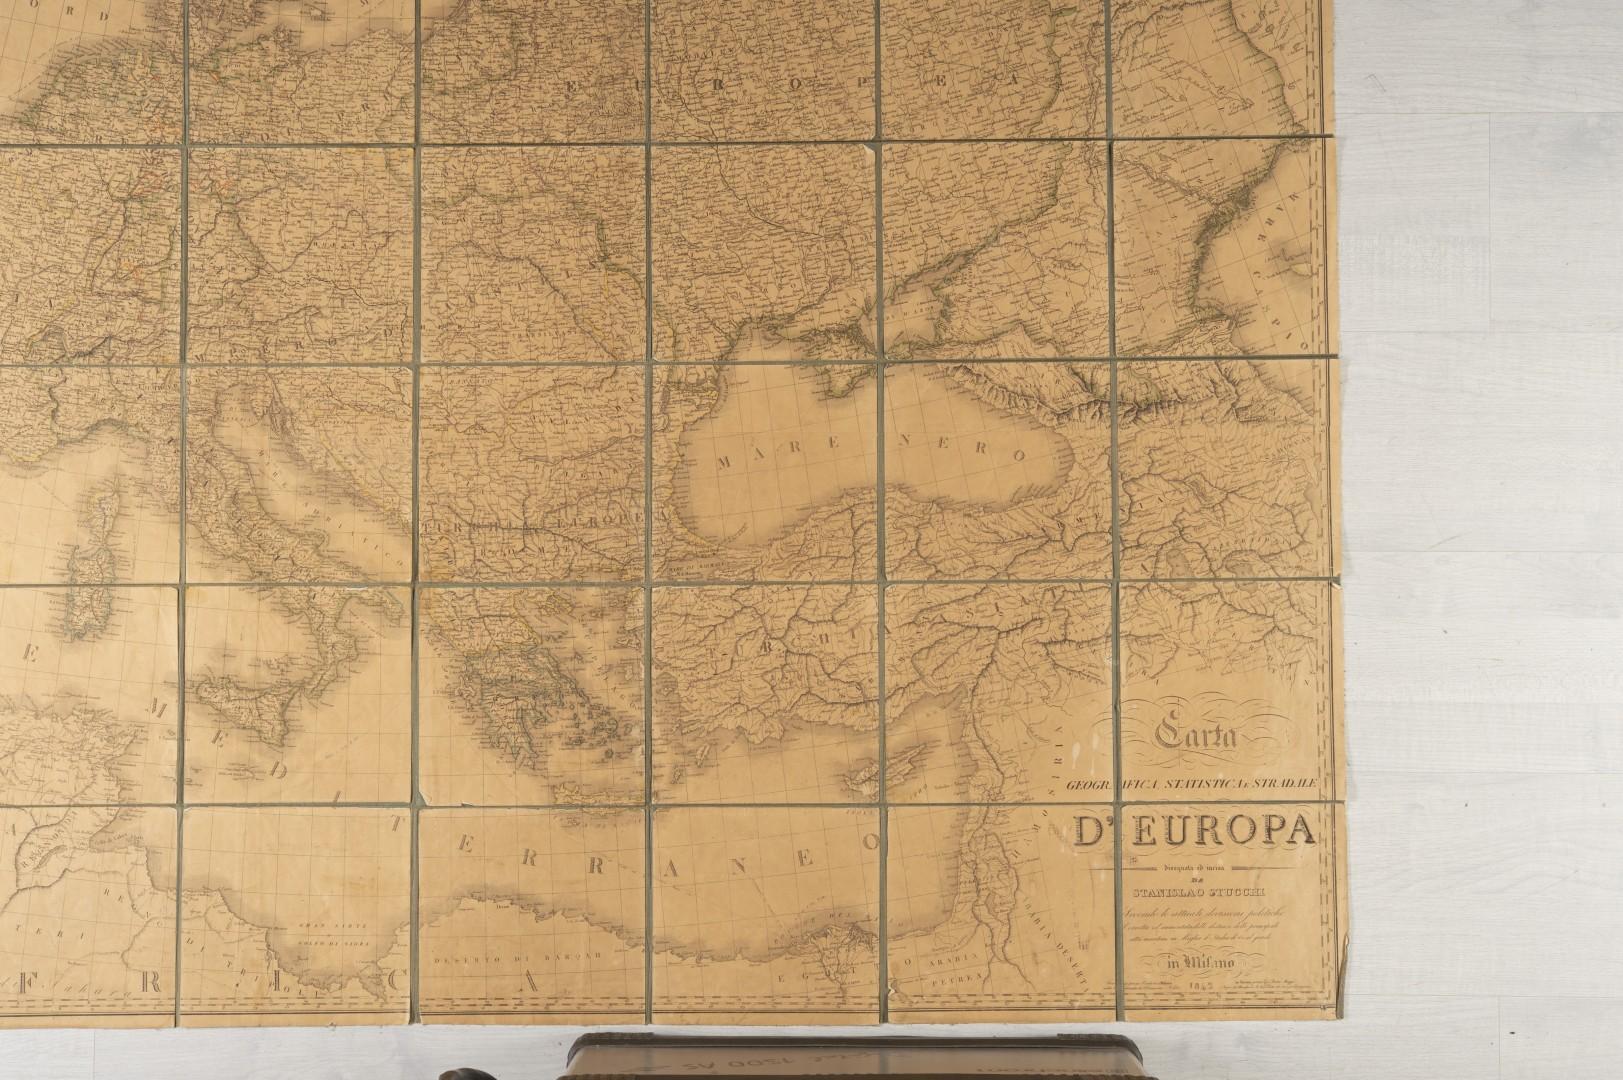 Stucchi, Stanislao Carta geografica statistica e stradale d'Europa. - Image 6 of 8